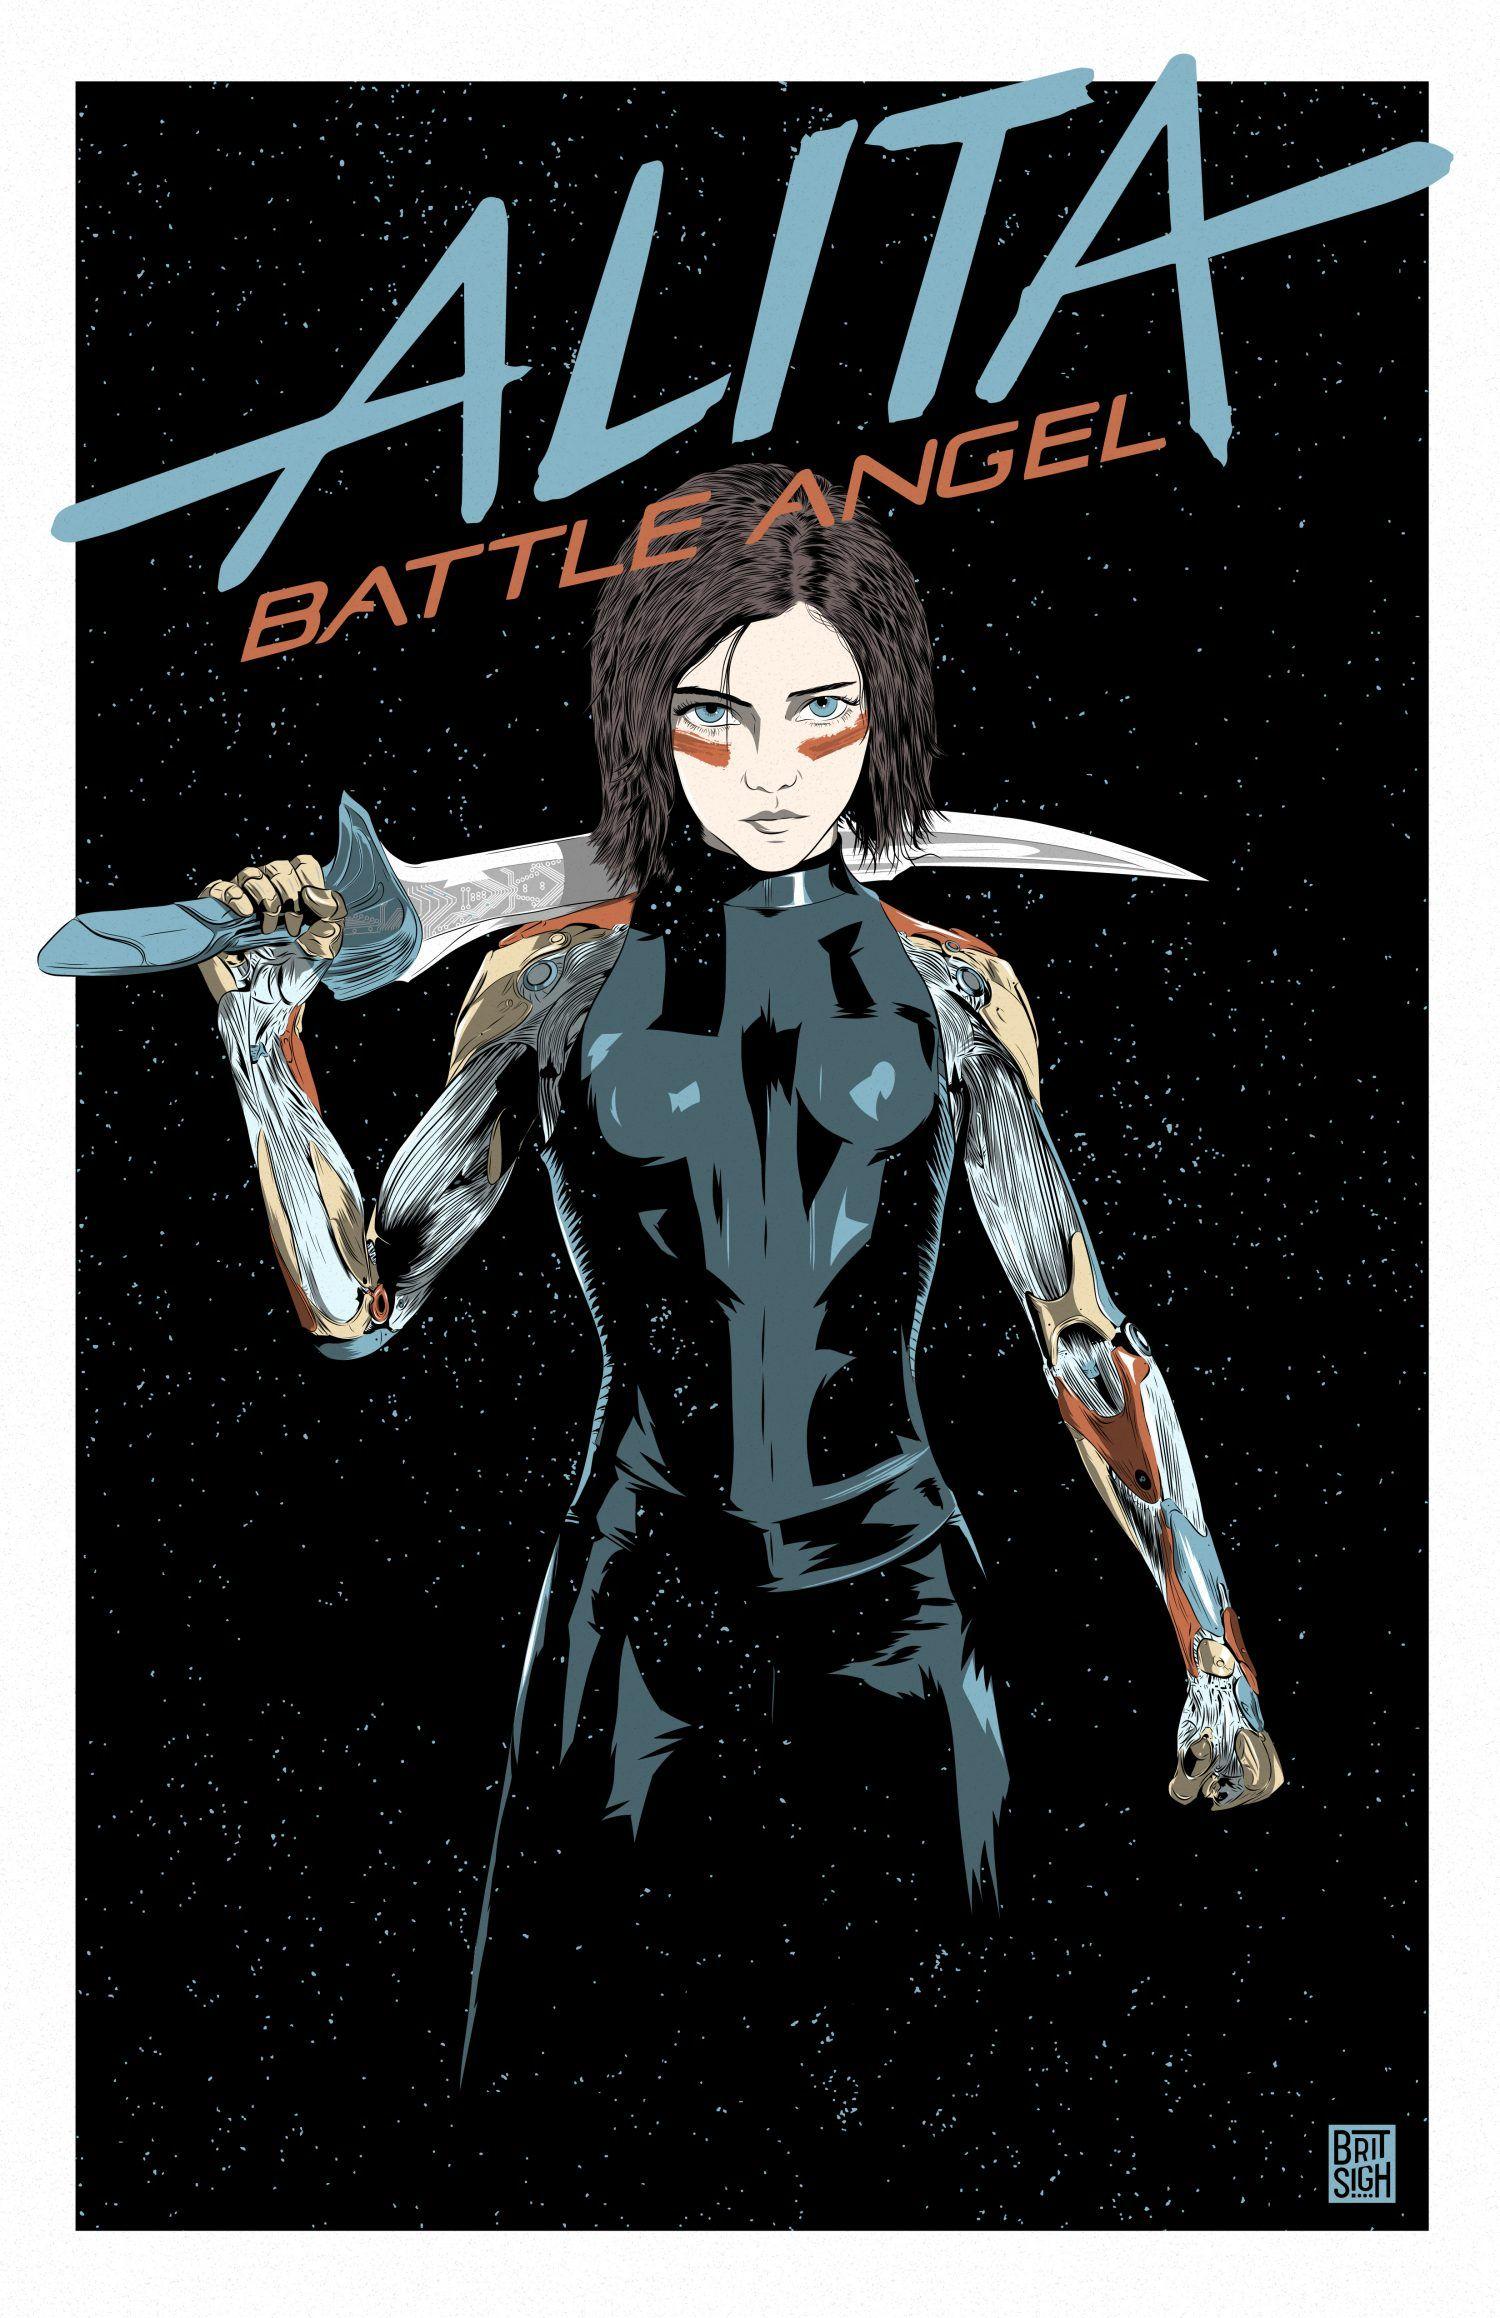 Alita Battle Angel Alita movie, Alternative movie